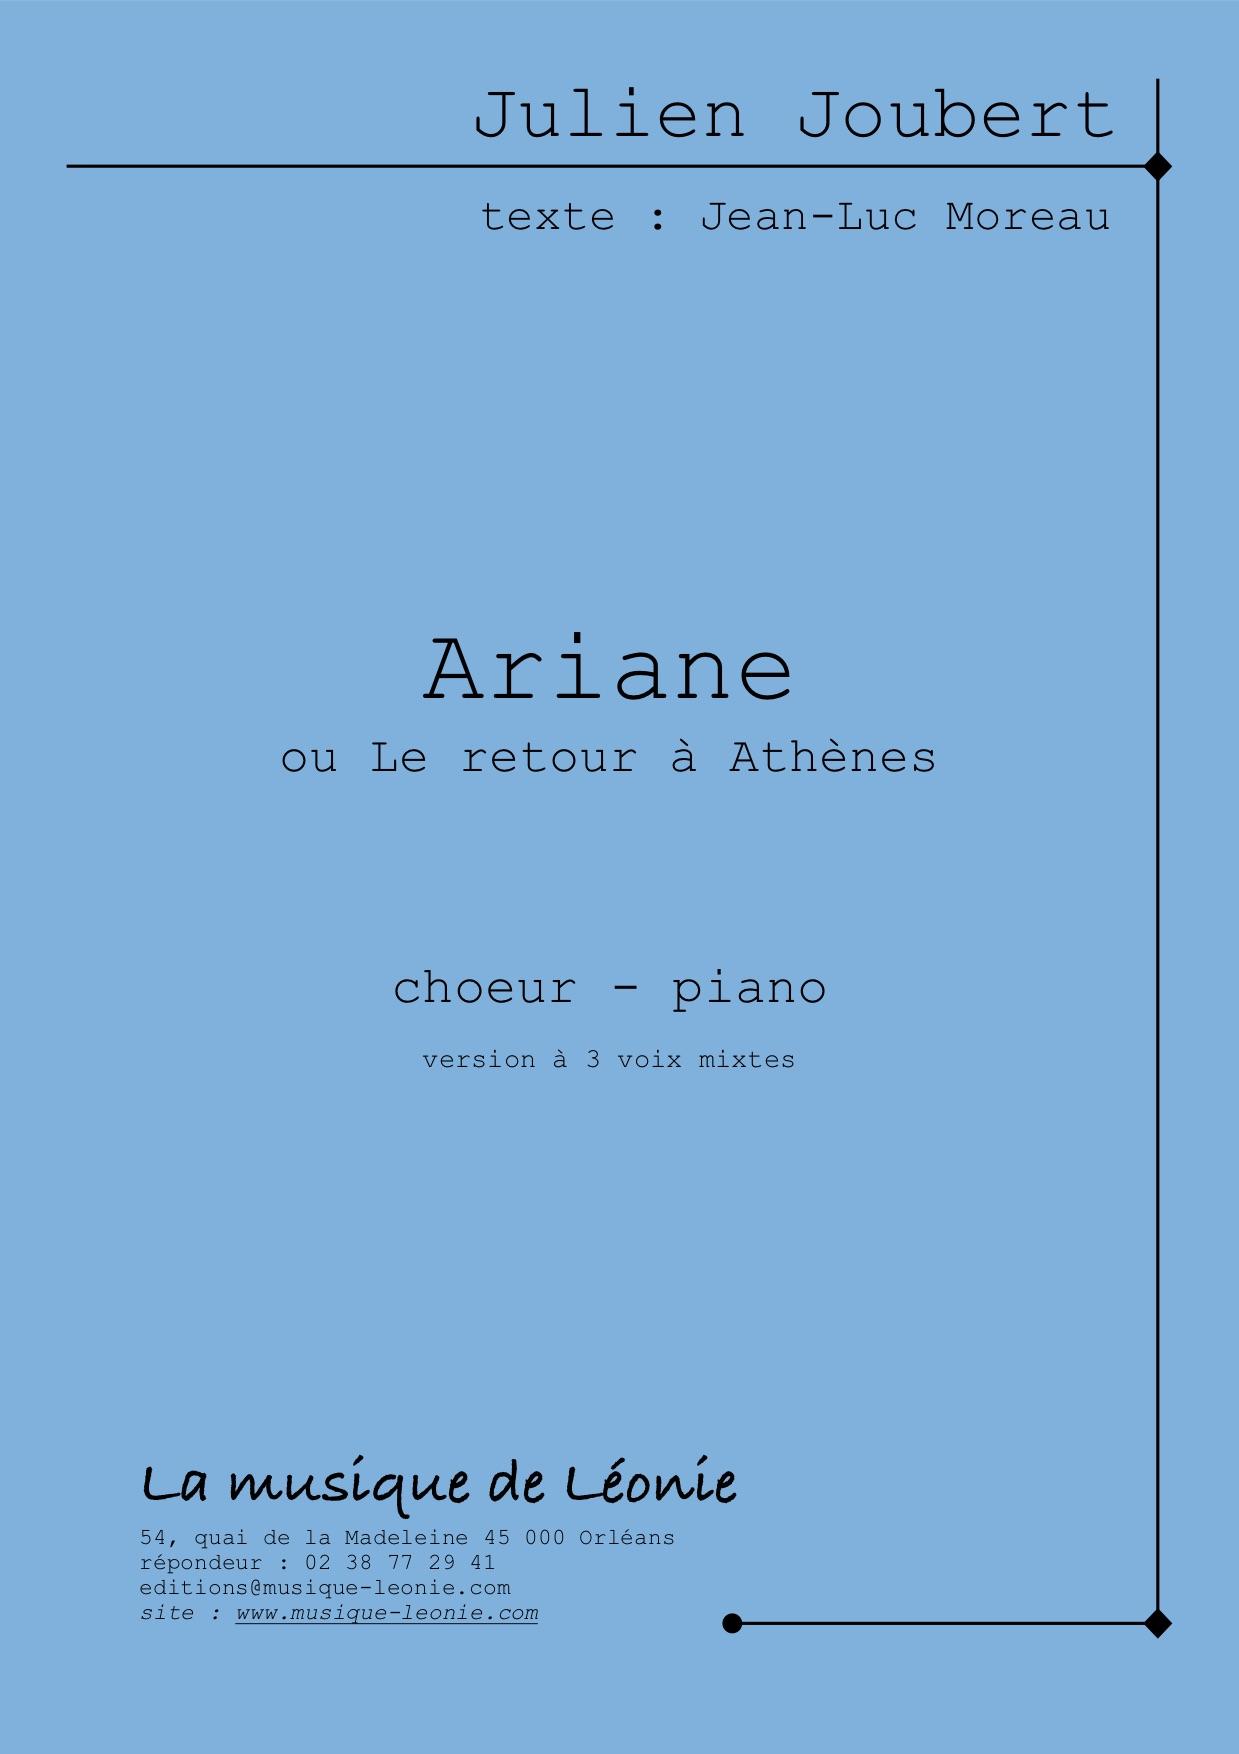 Ariane ou le retour à Athènes